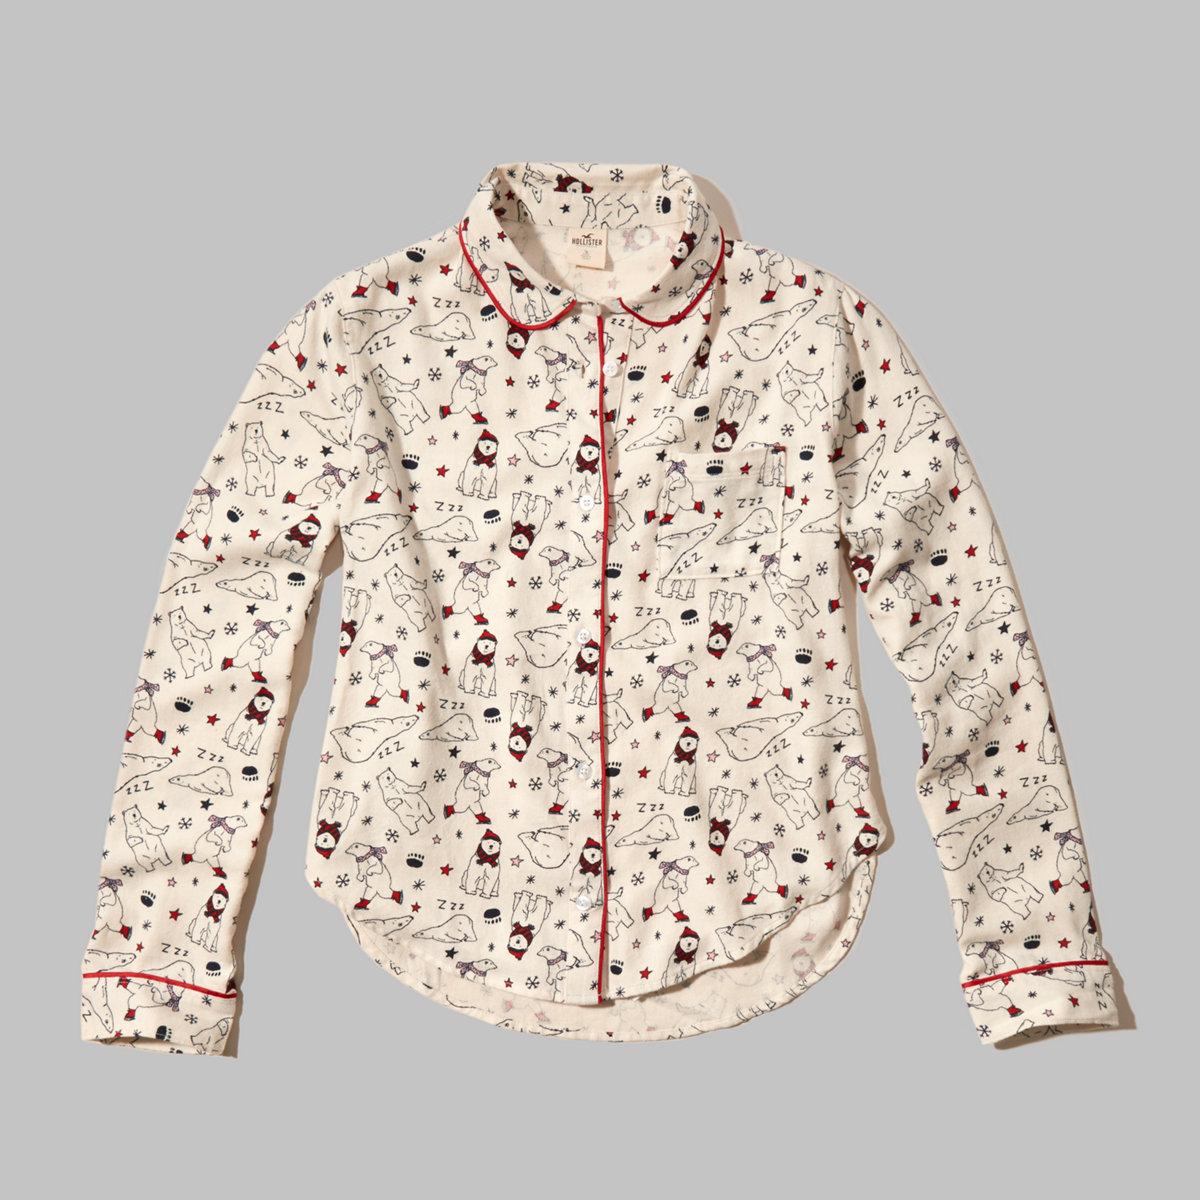 Flannel Sleep Shirt